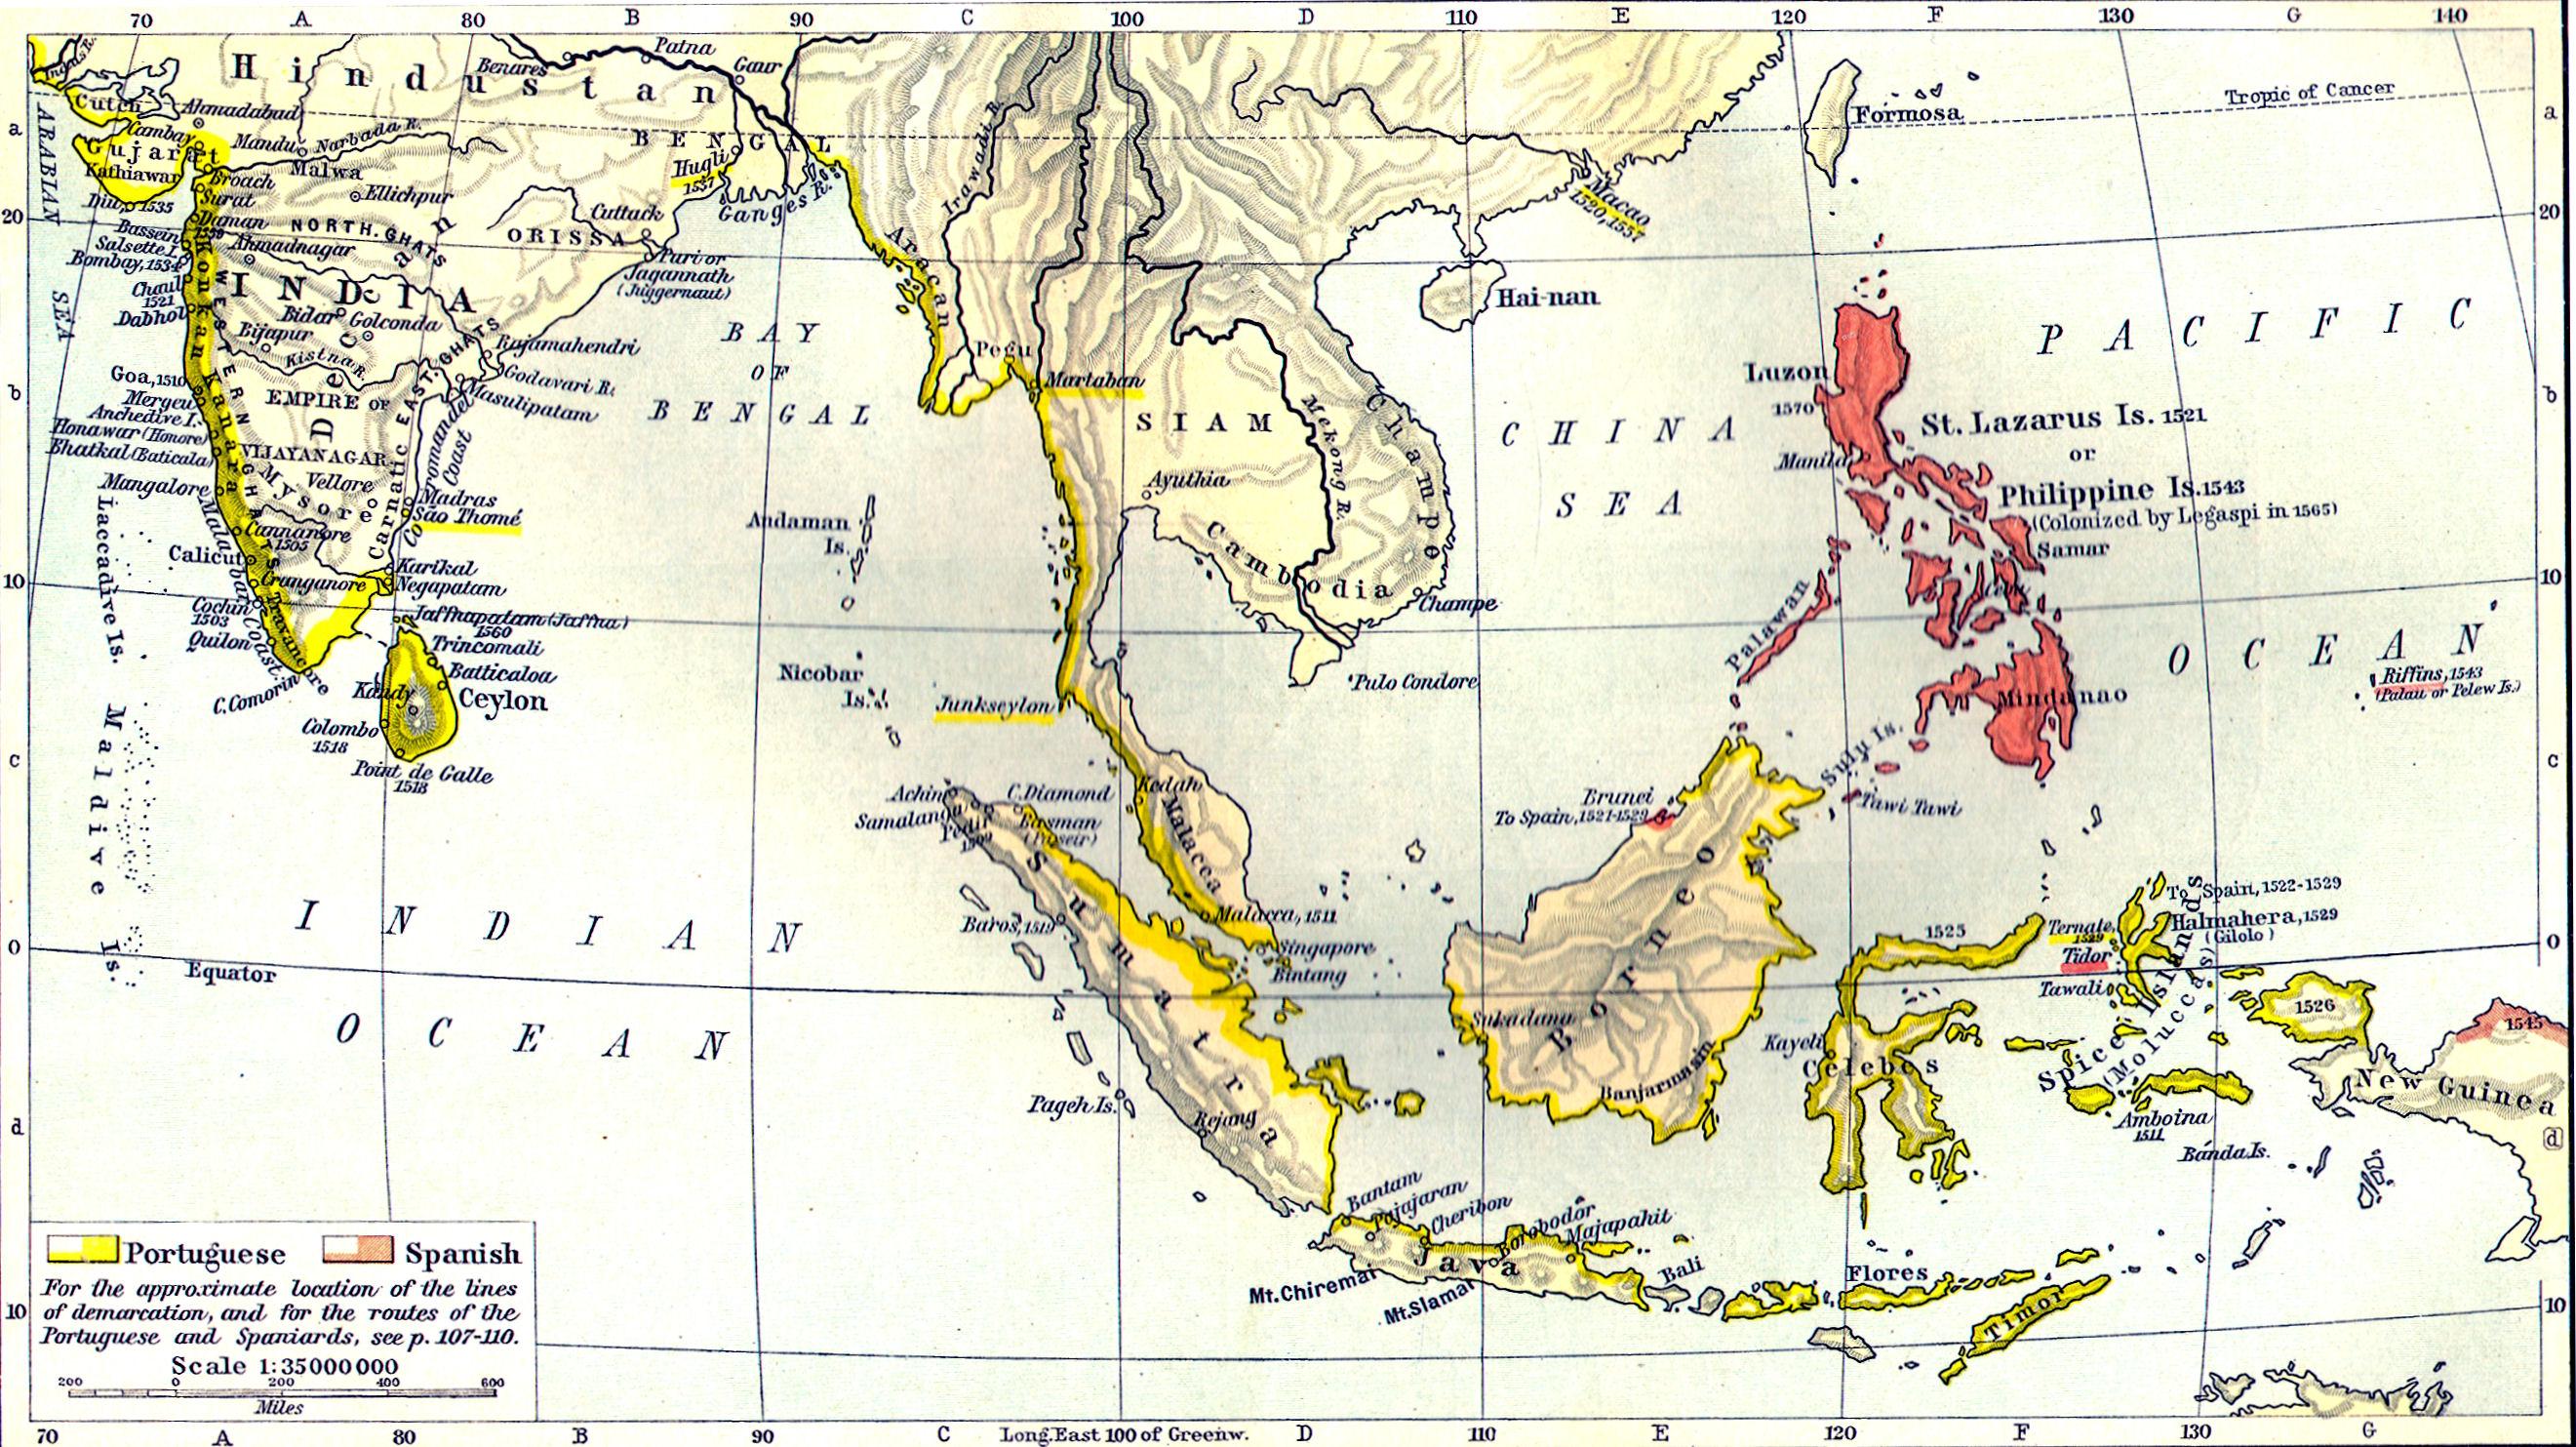 http://www.heritage-history.com/maps/shepherd/shep112.jpg